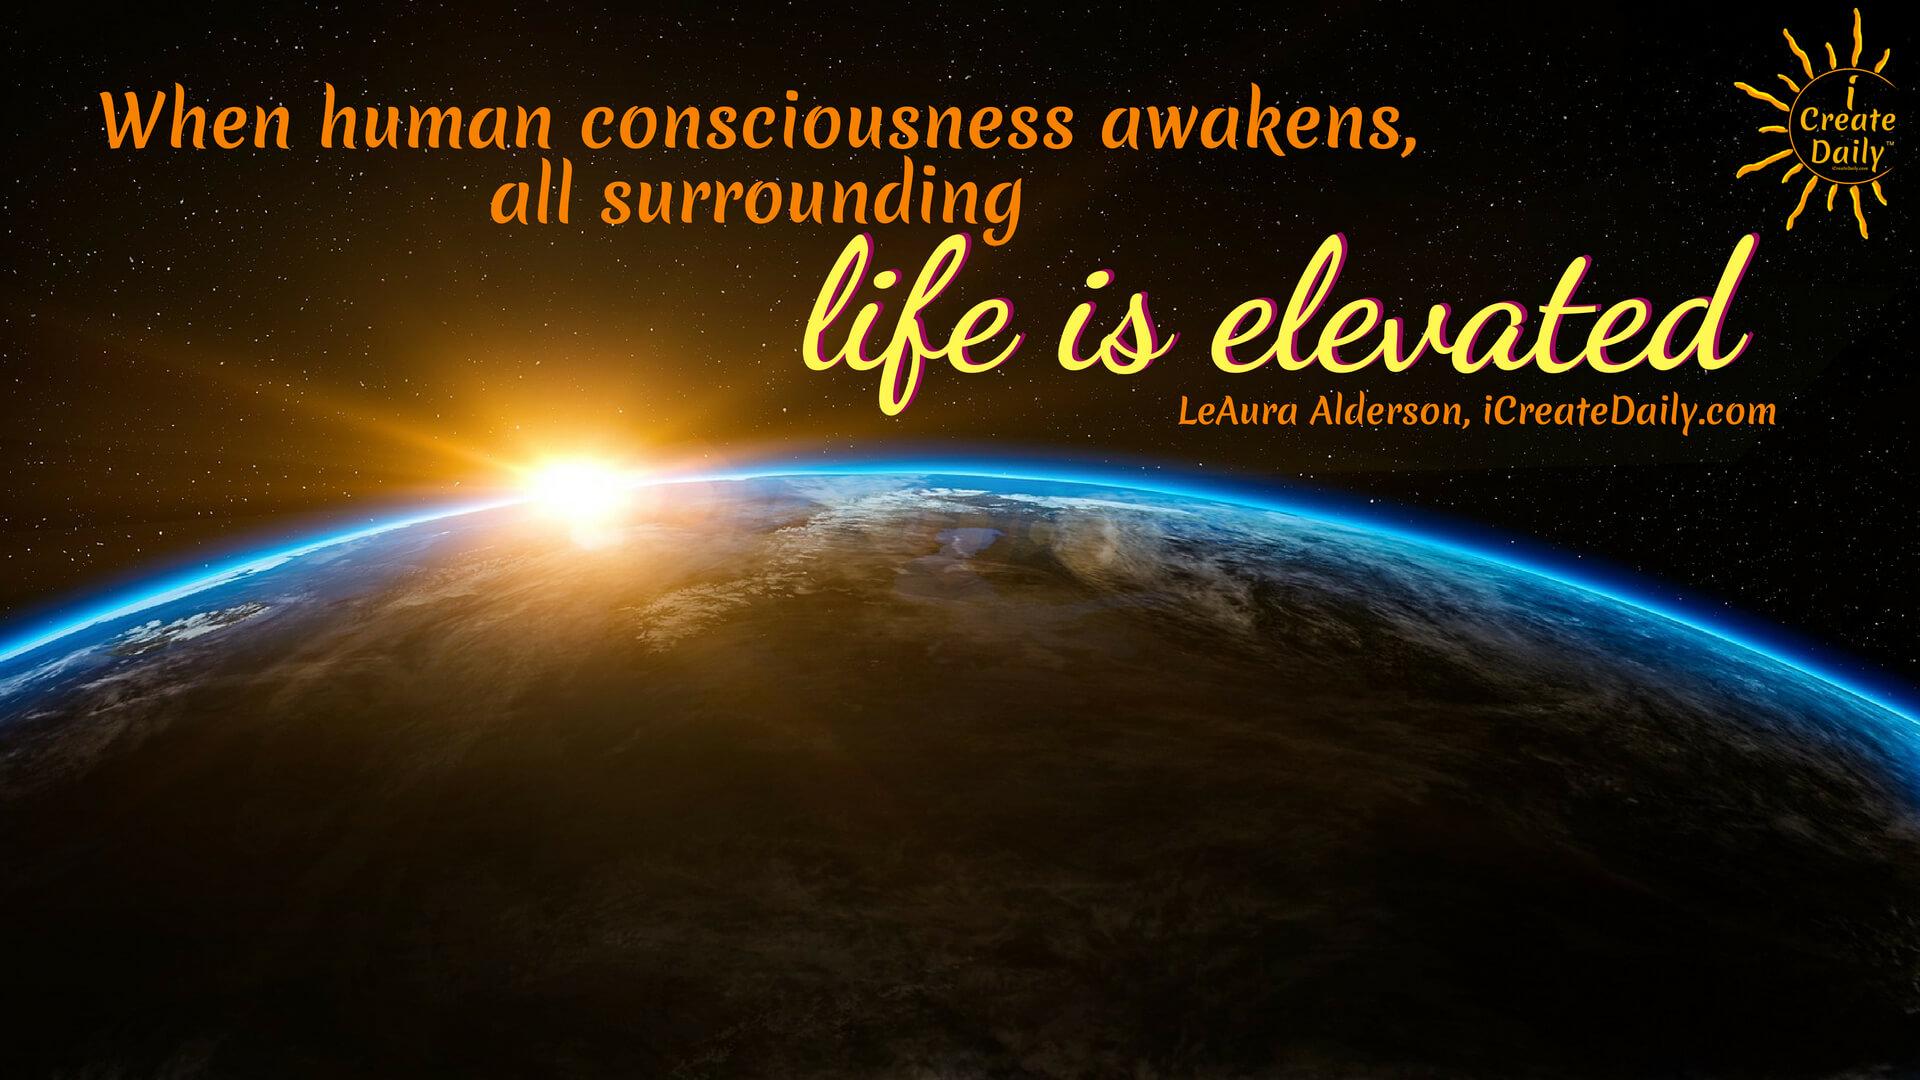 When Human Consciousness Awakens